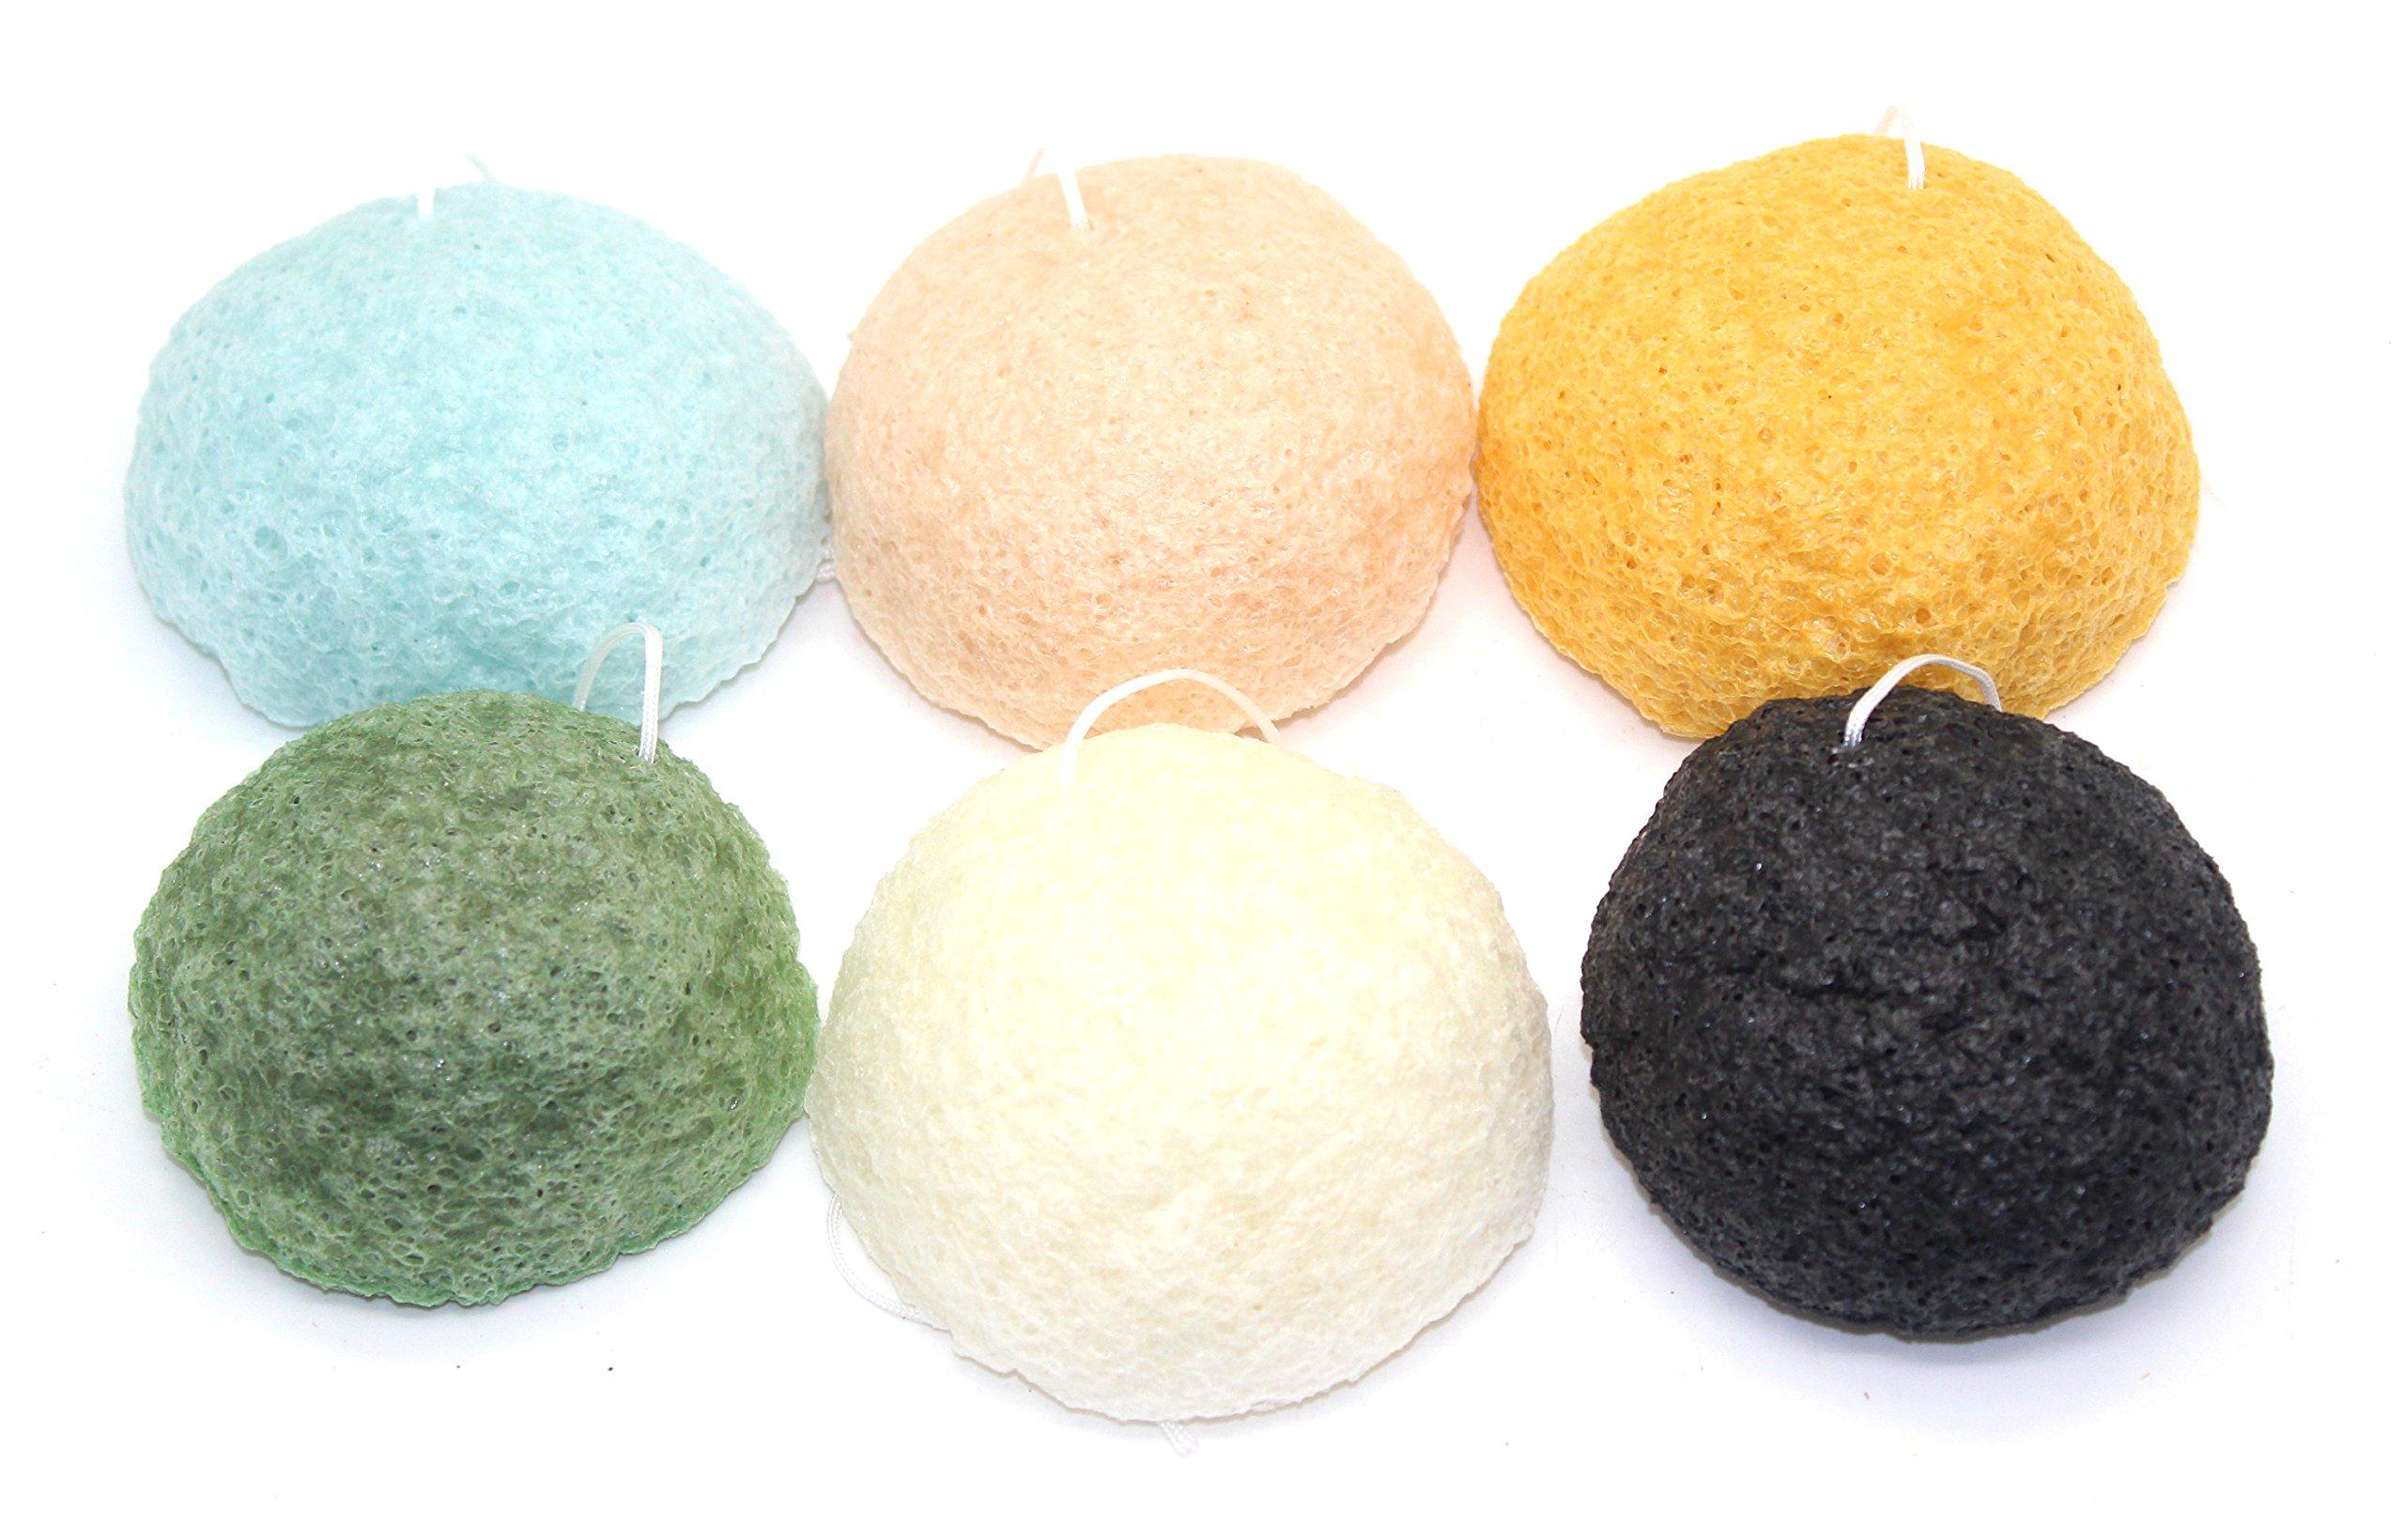 Konjac Sponge Puff - Set of 6 Varieties - Original, Charcoal, Cherry Blossom, Wild Mint, Yuzu, and Green Tea, Our Earth's Secrets Made in Japan